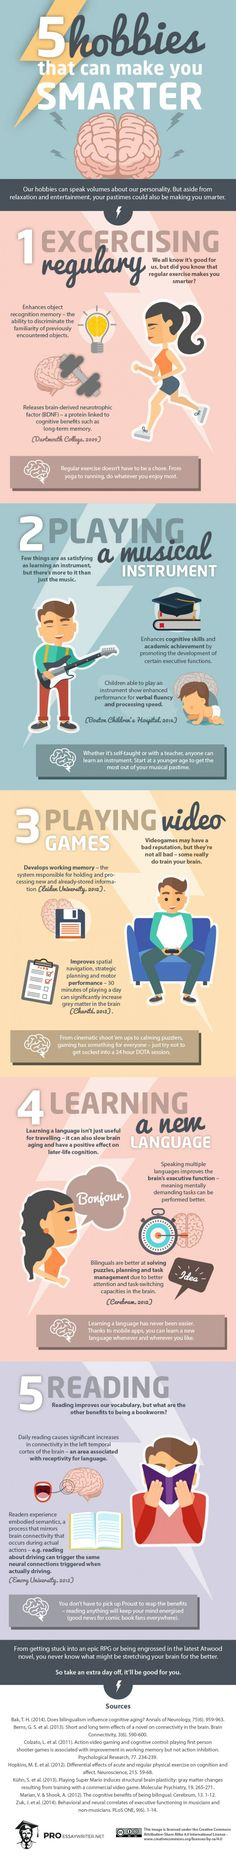 20151102063854-5-hobbies-make-you-smarter-infographic